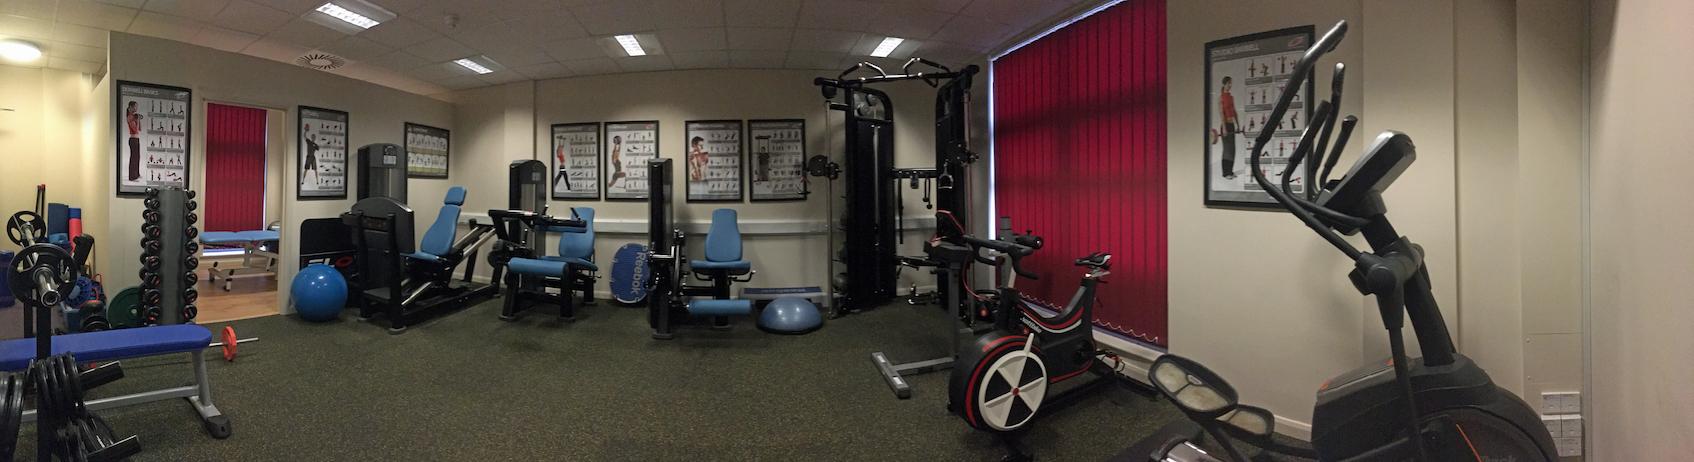 stow-rehab-gym